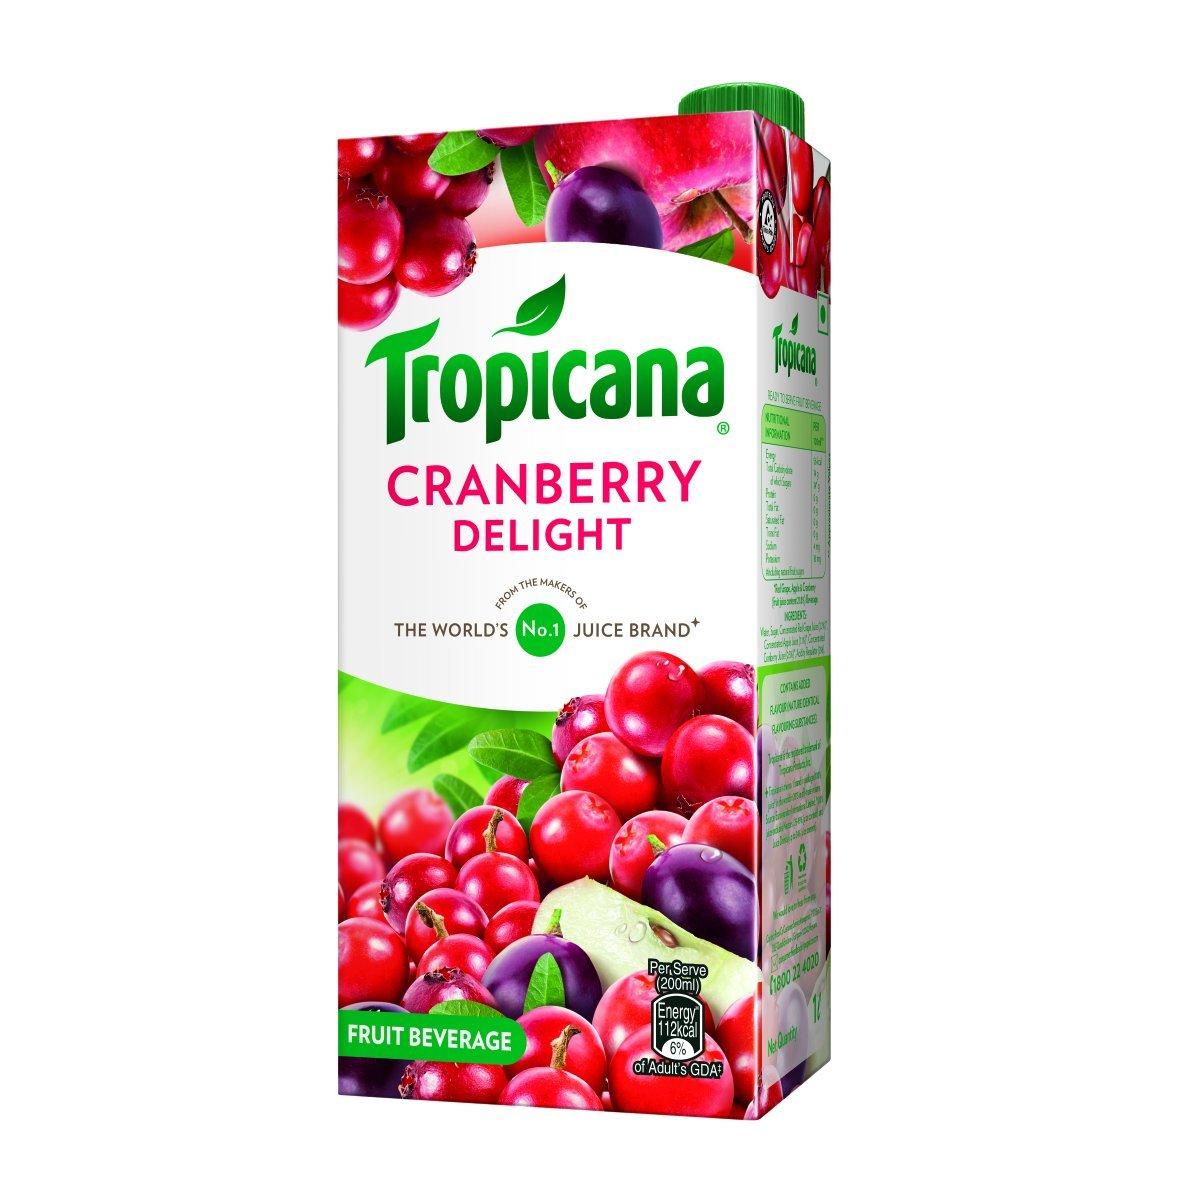 Tropicana Cranberry Delight Fruit Juice 1 Ltr